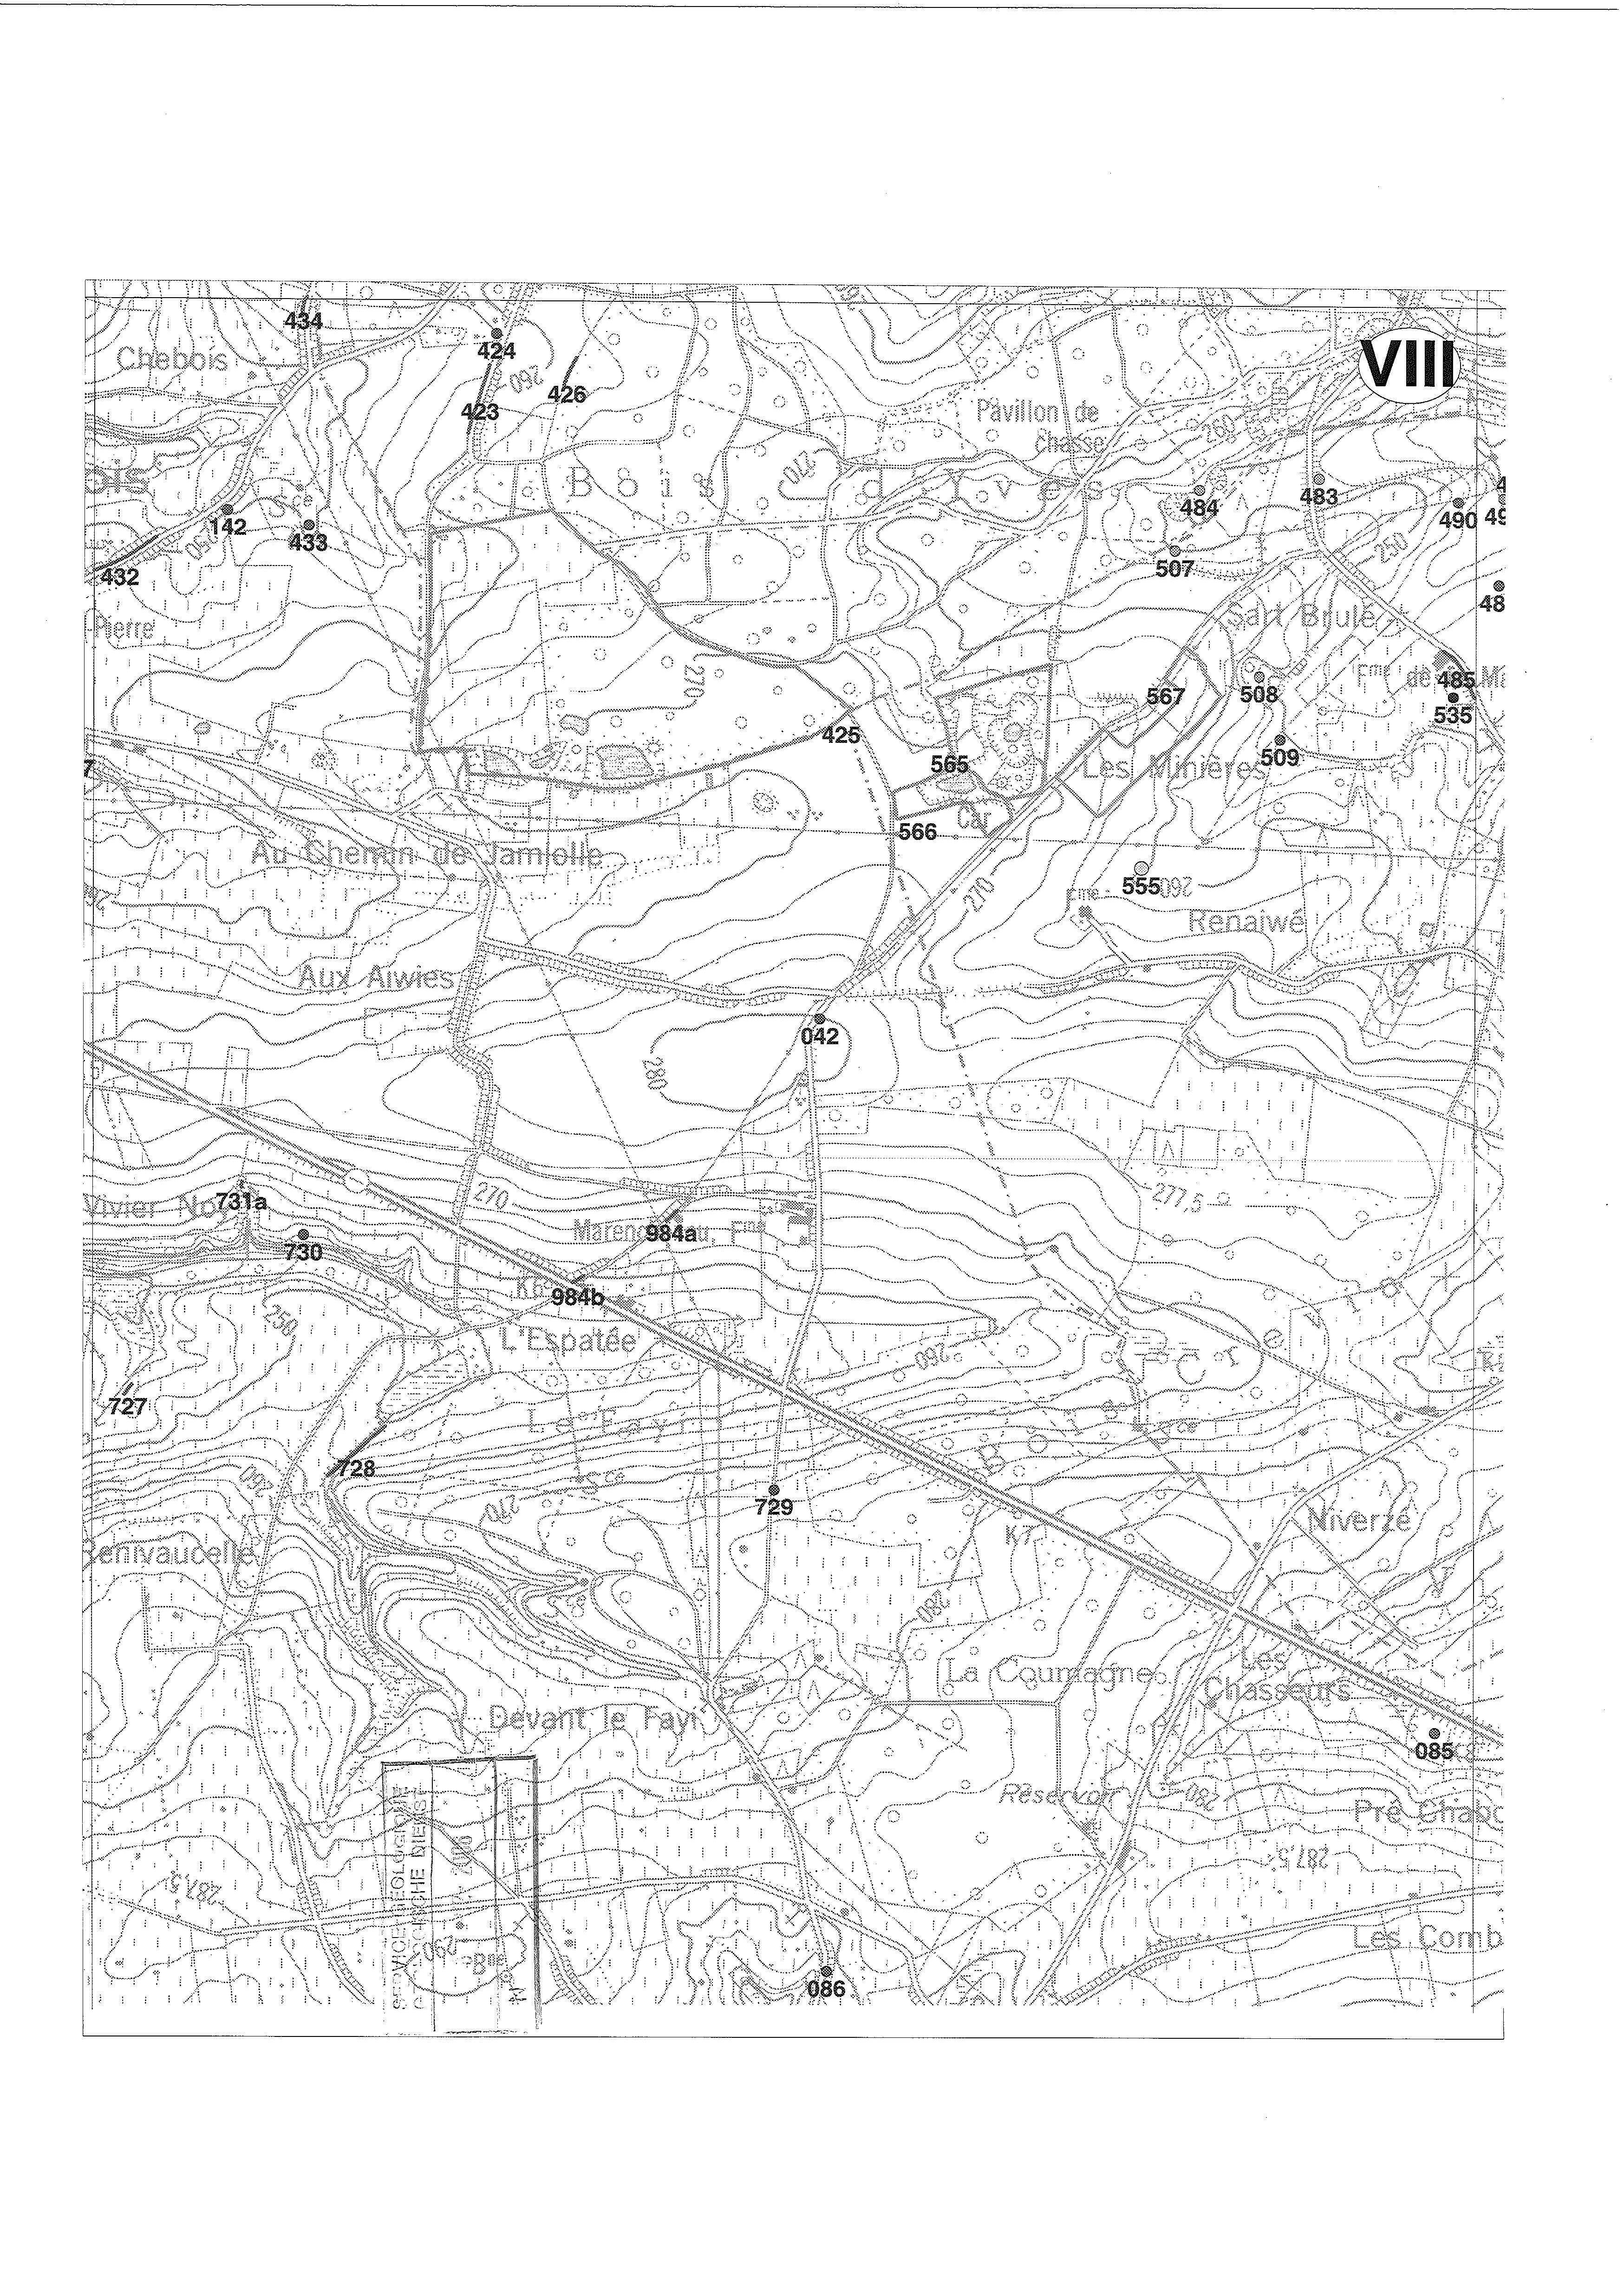 173E_Walcourt_Page_8_Image_0001.jpg